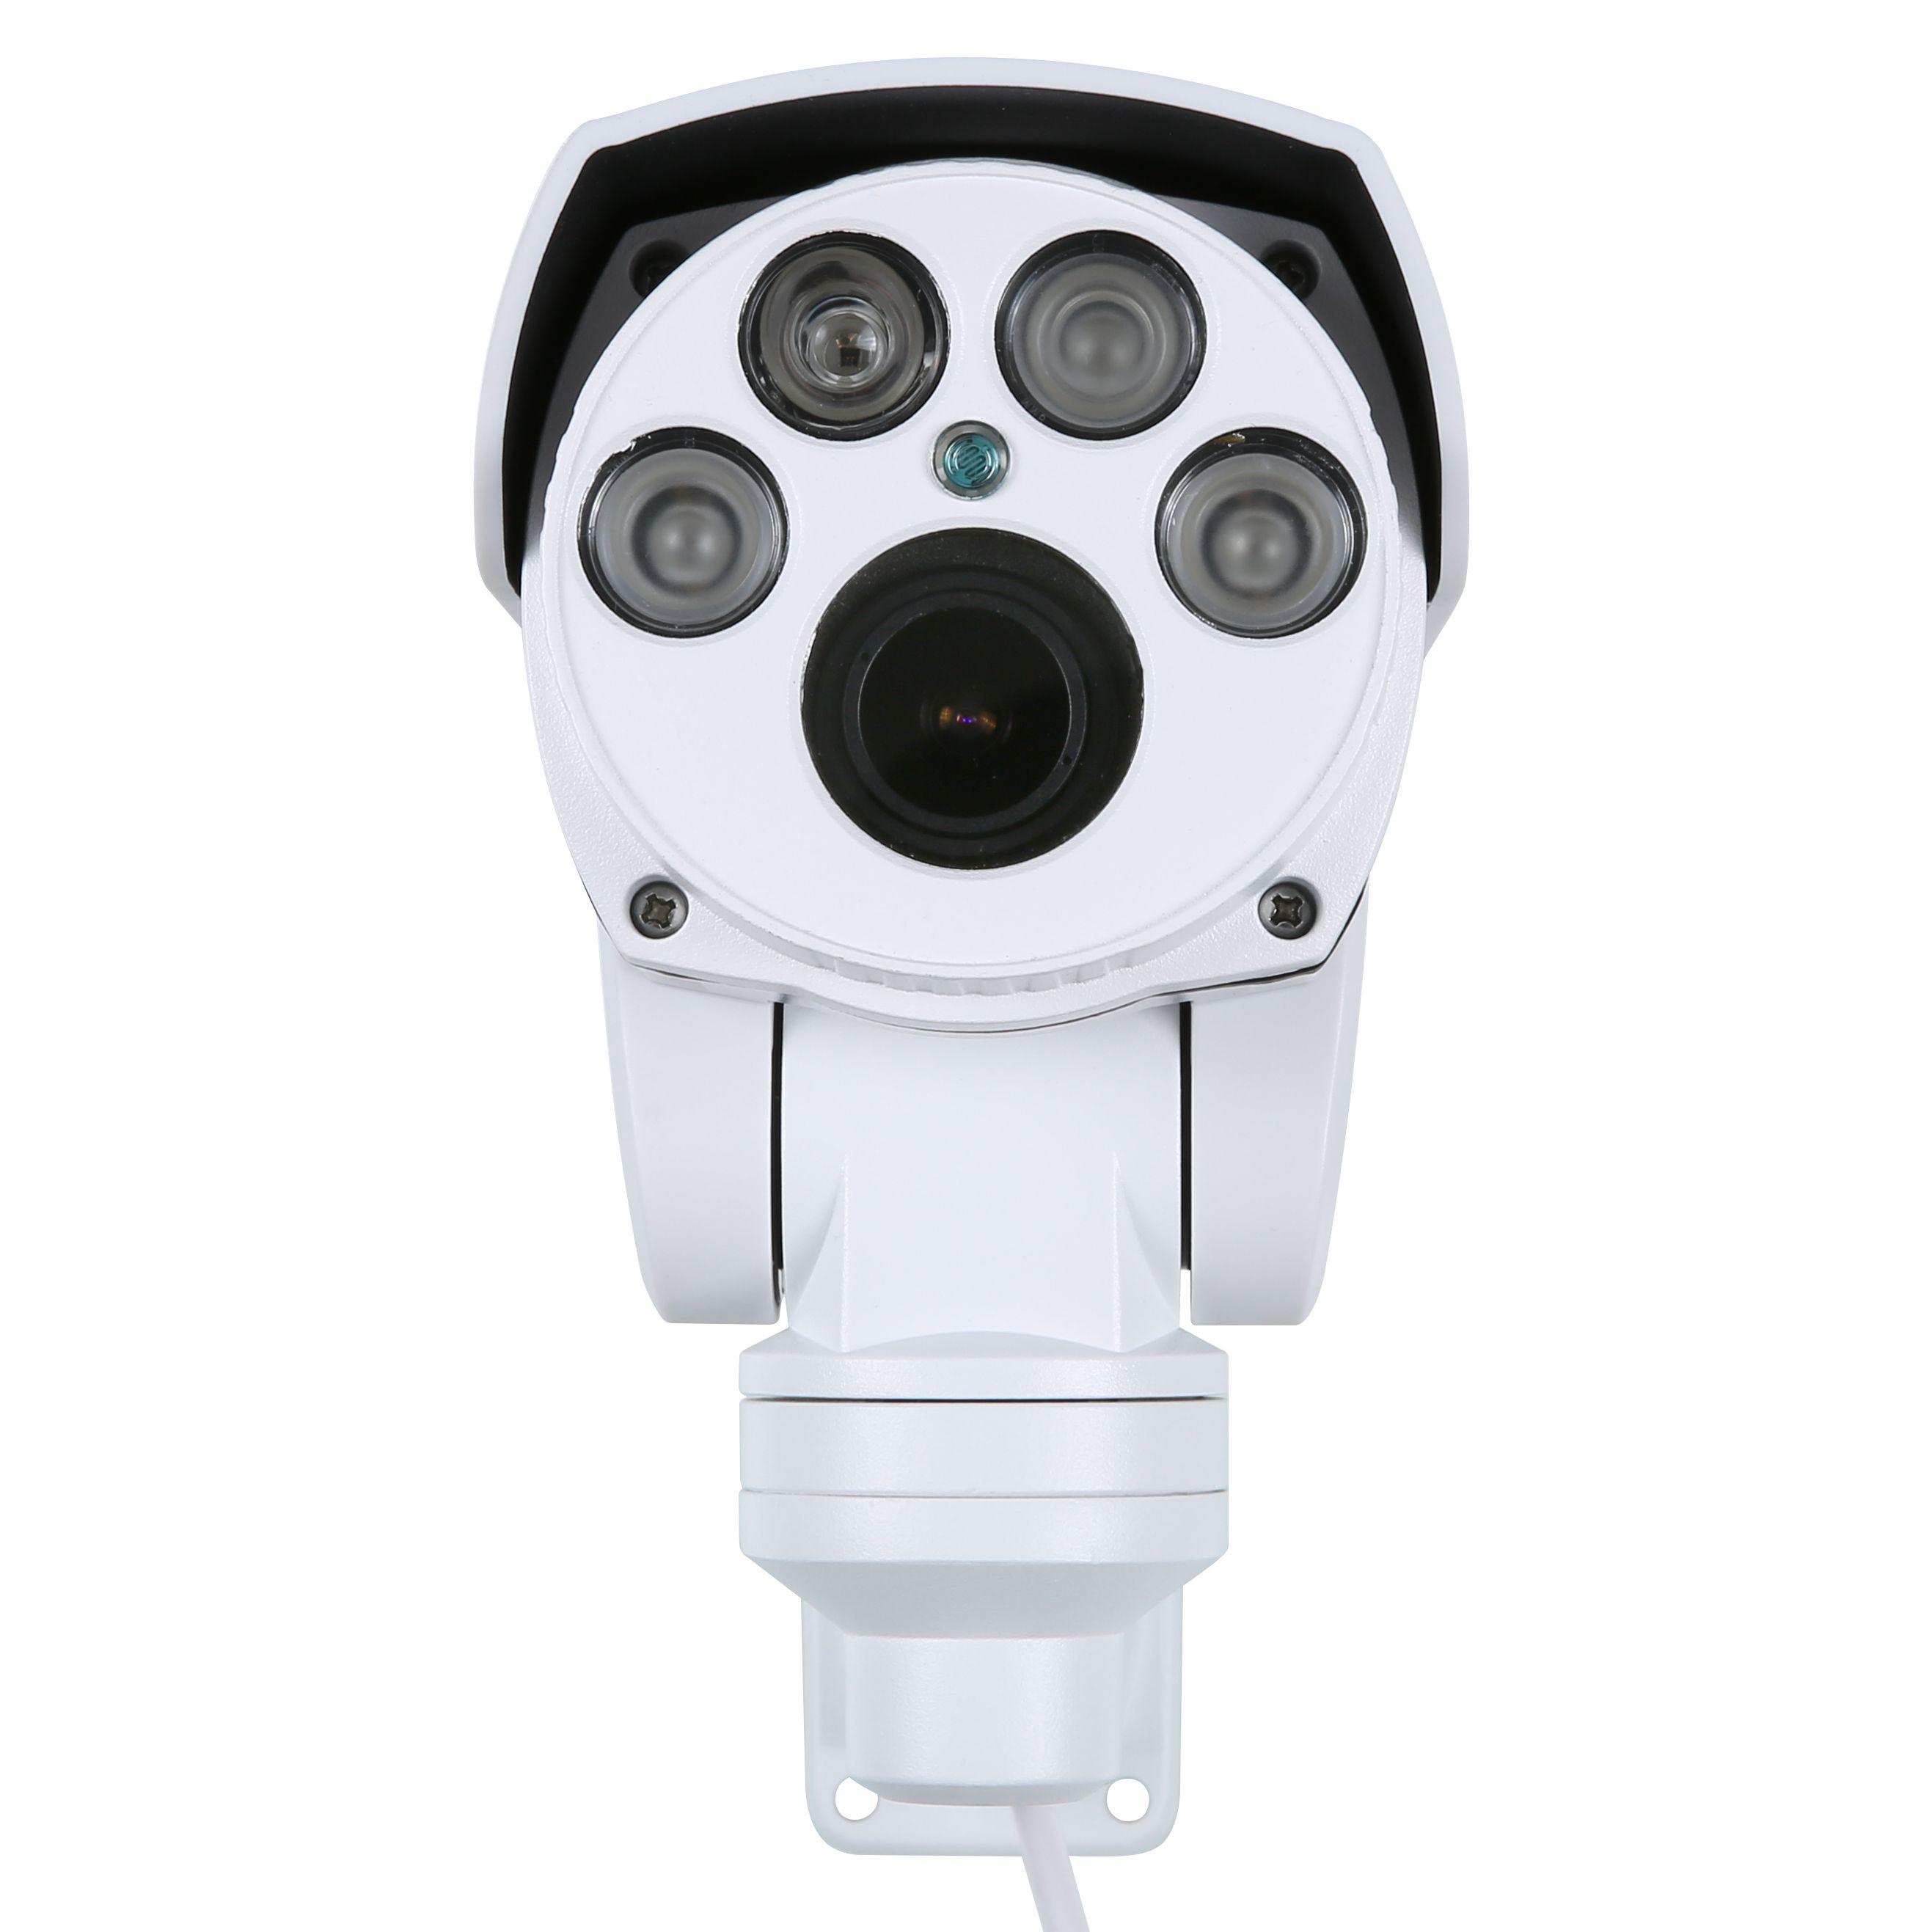 SANNCE AHD Full HD 1080P Camera 4in1 Autofocus Varifocal 5-50mm 10X Digital Zoom Pan/Tilt Bullet PTZ Camera IP66 In/outdoor